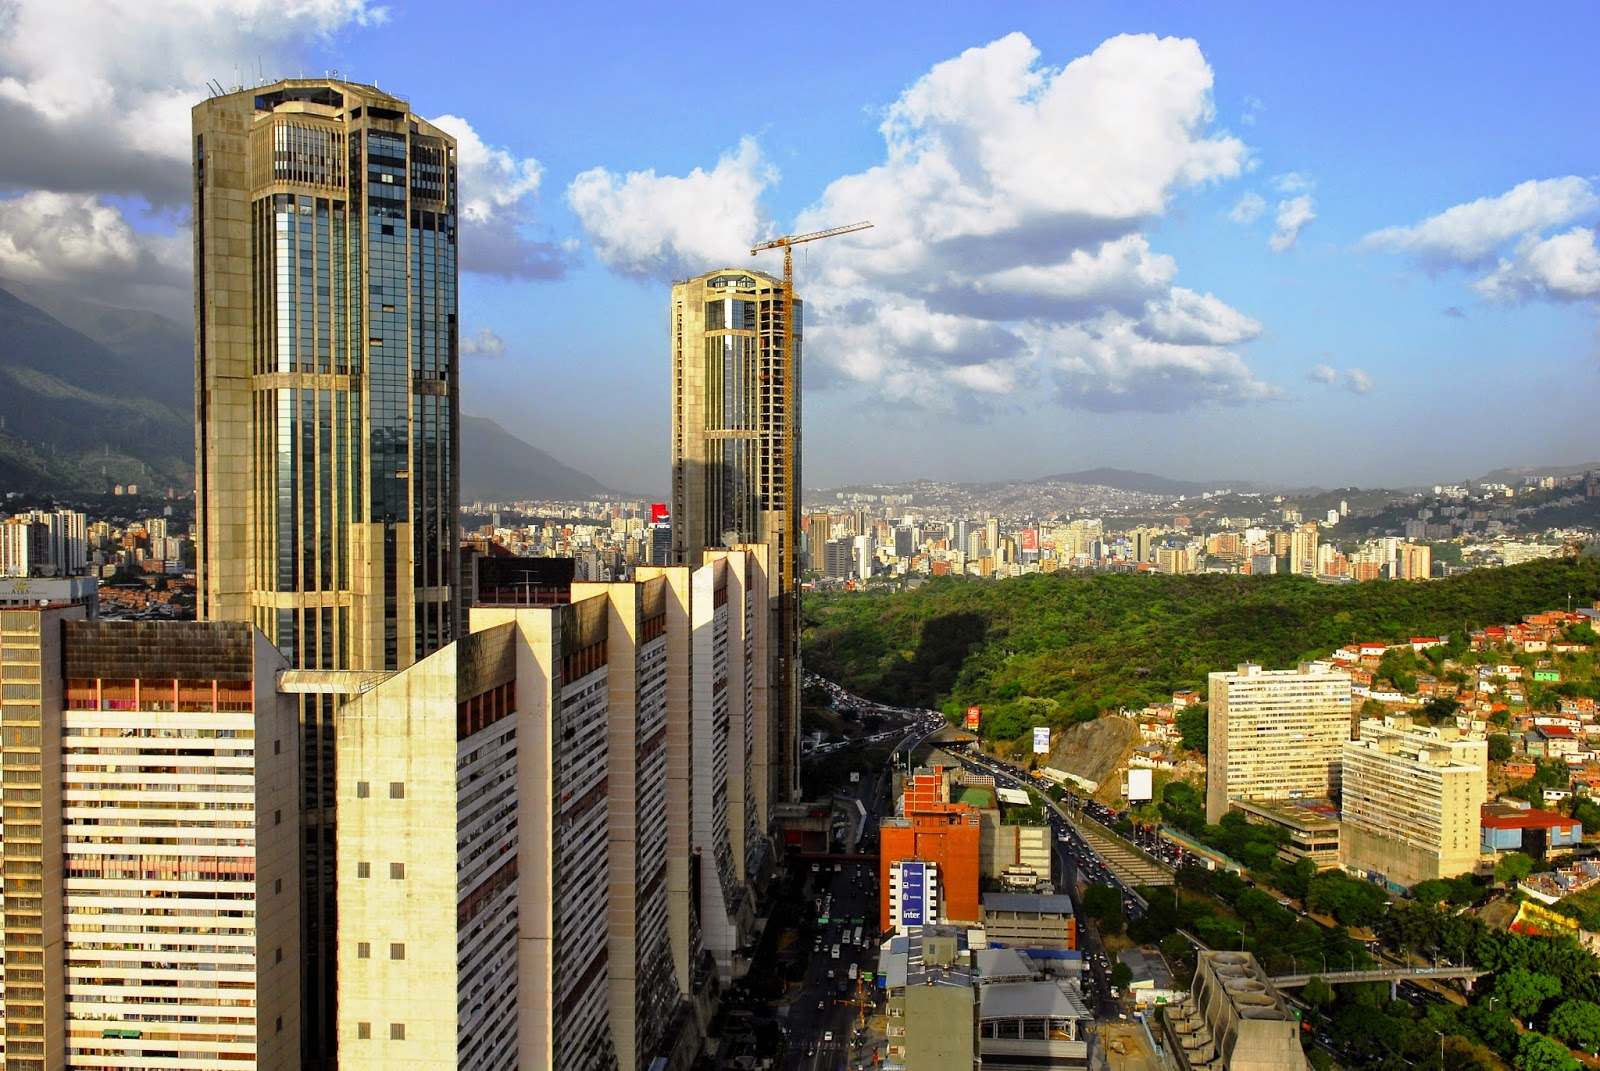 CaracasParqueCentral